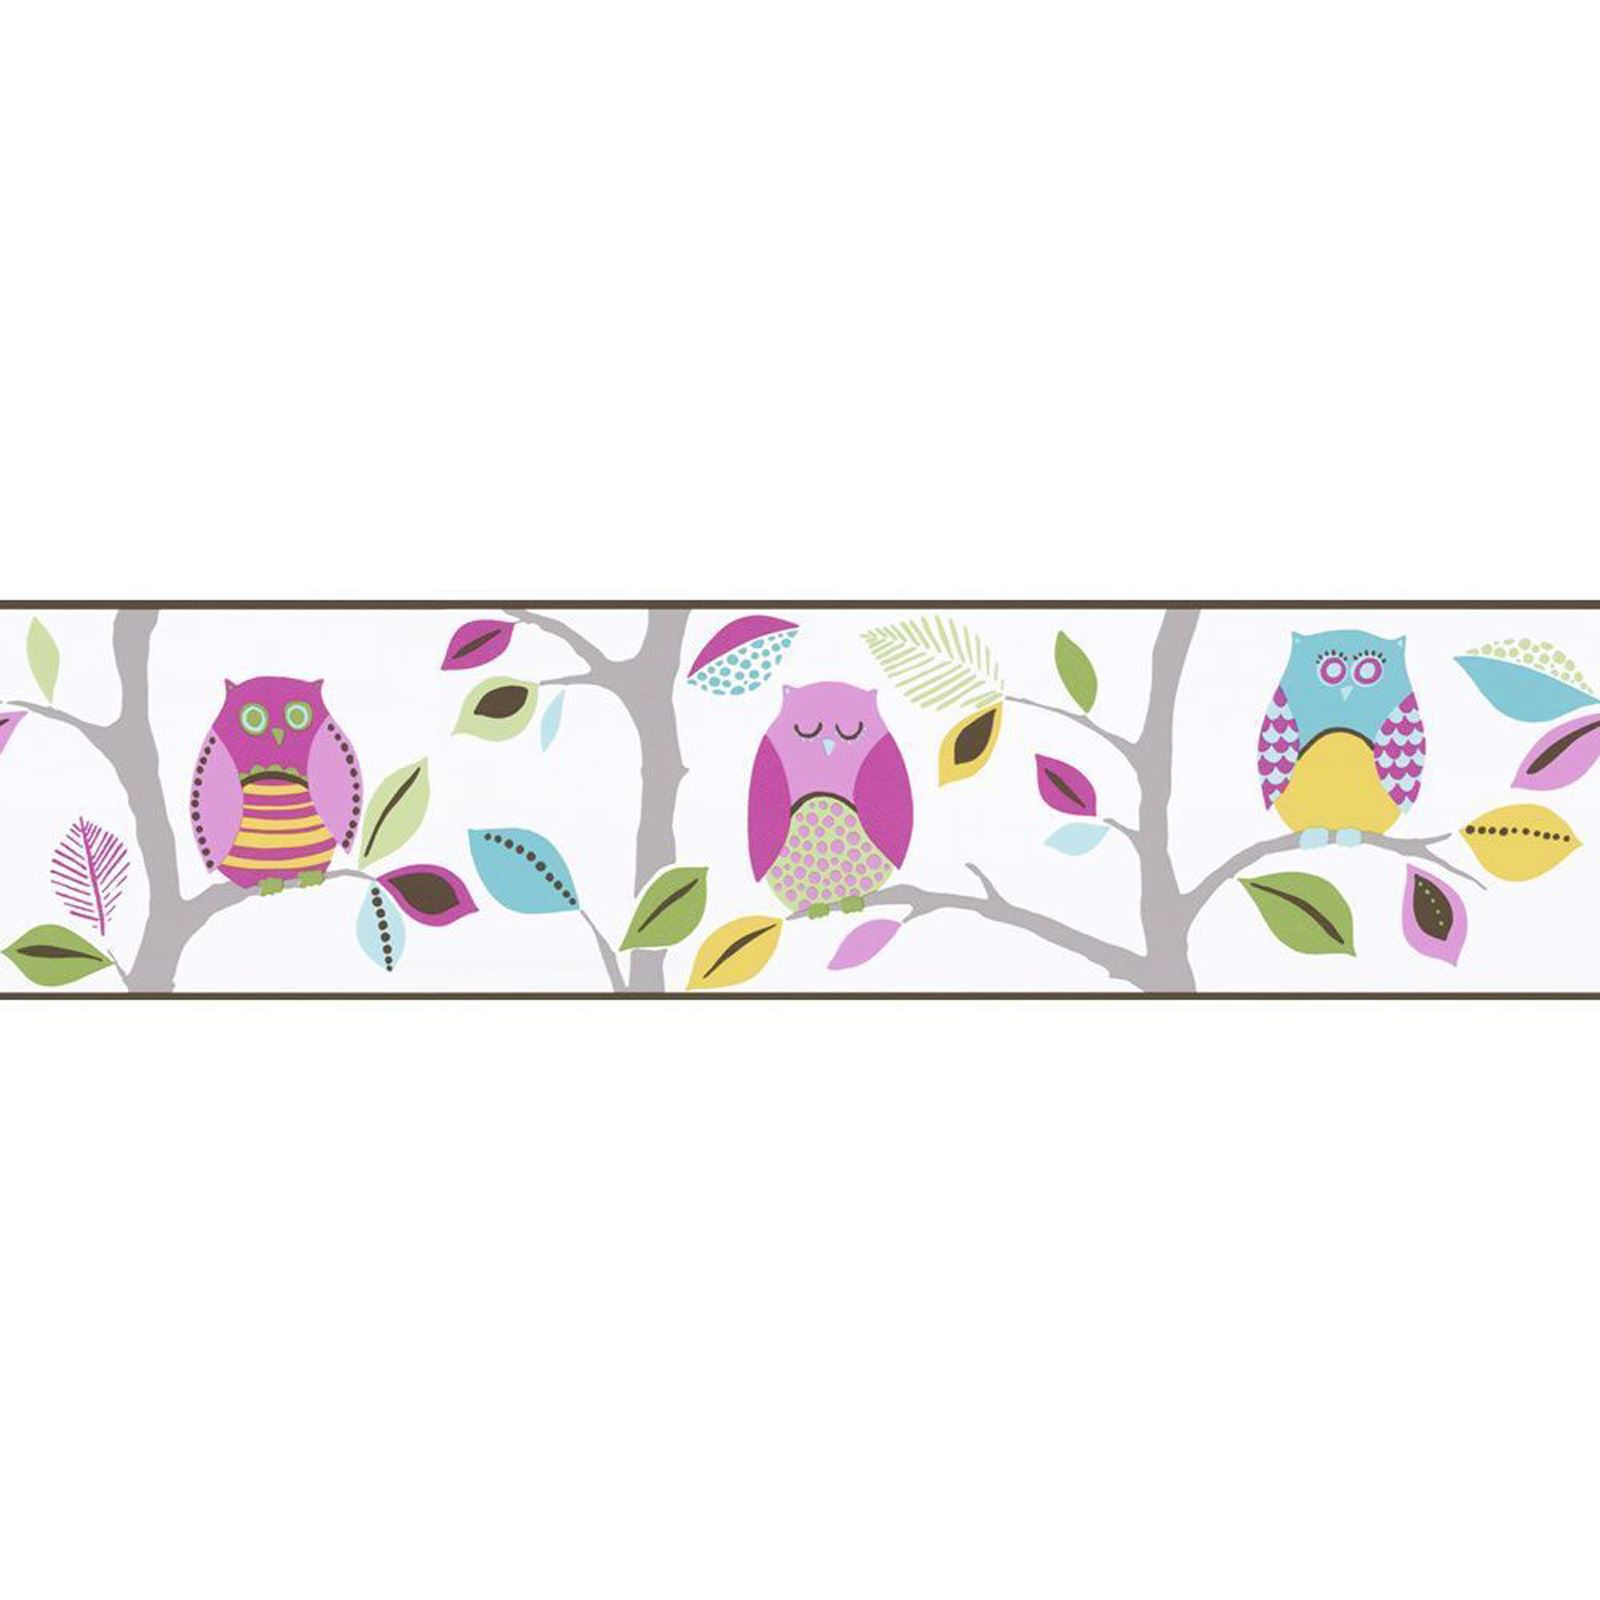 BRIGHT OWLS SELF ADHESIVE WALLPAPER BORDERS 8955 23 AS CREATION 1600x1600